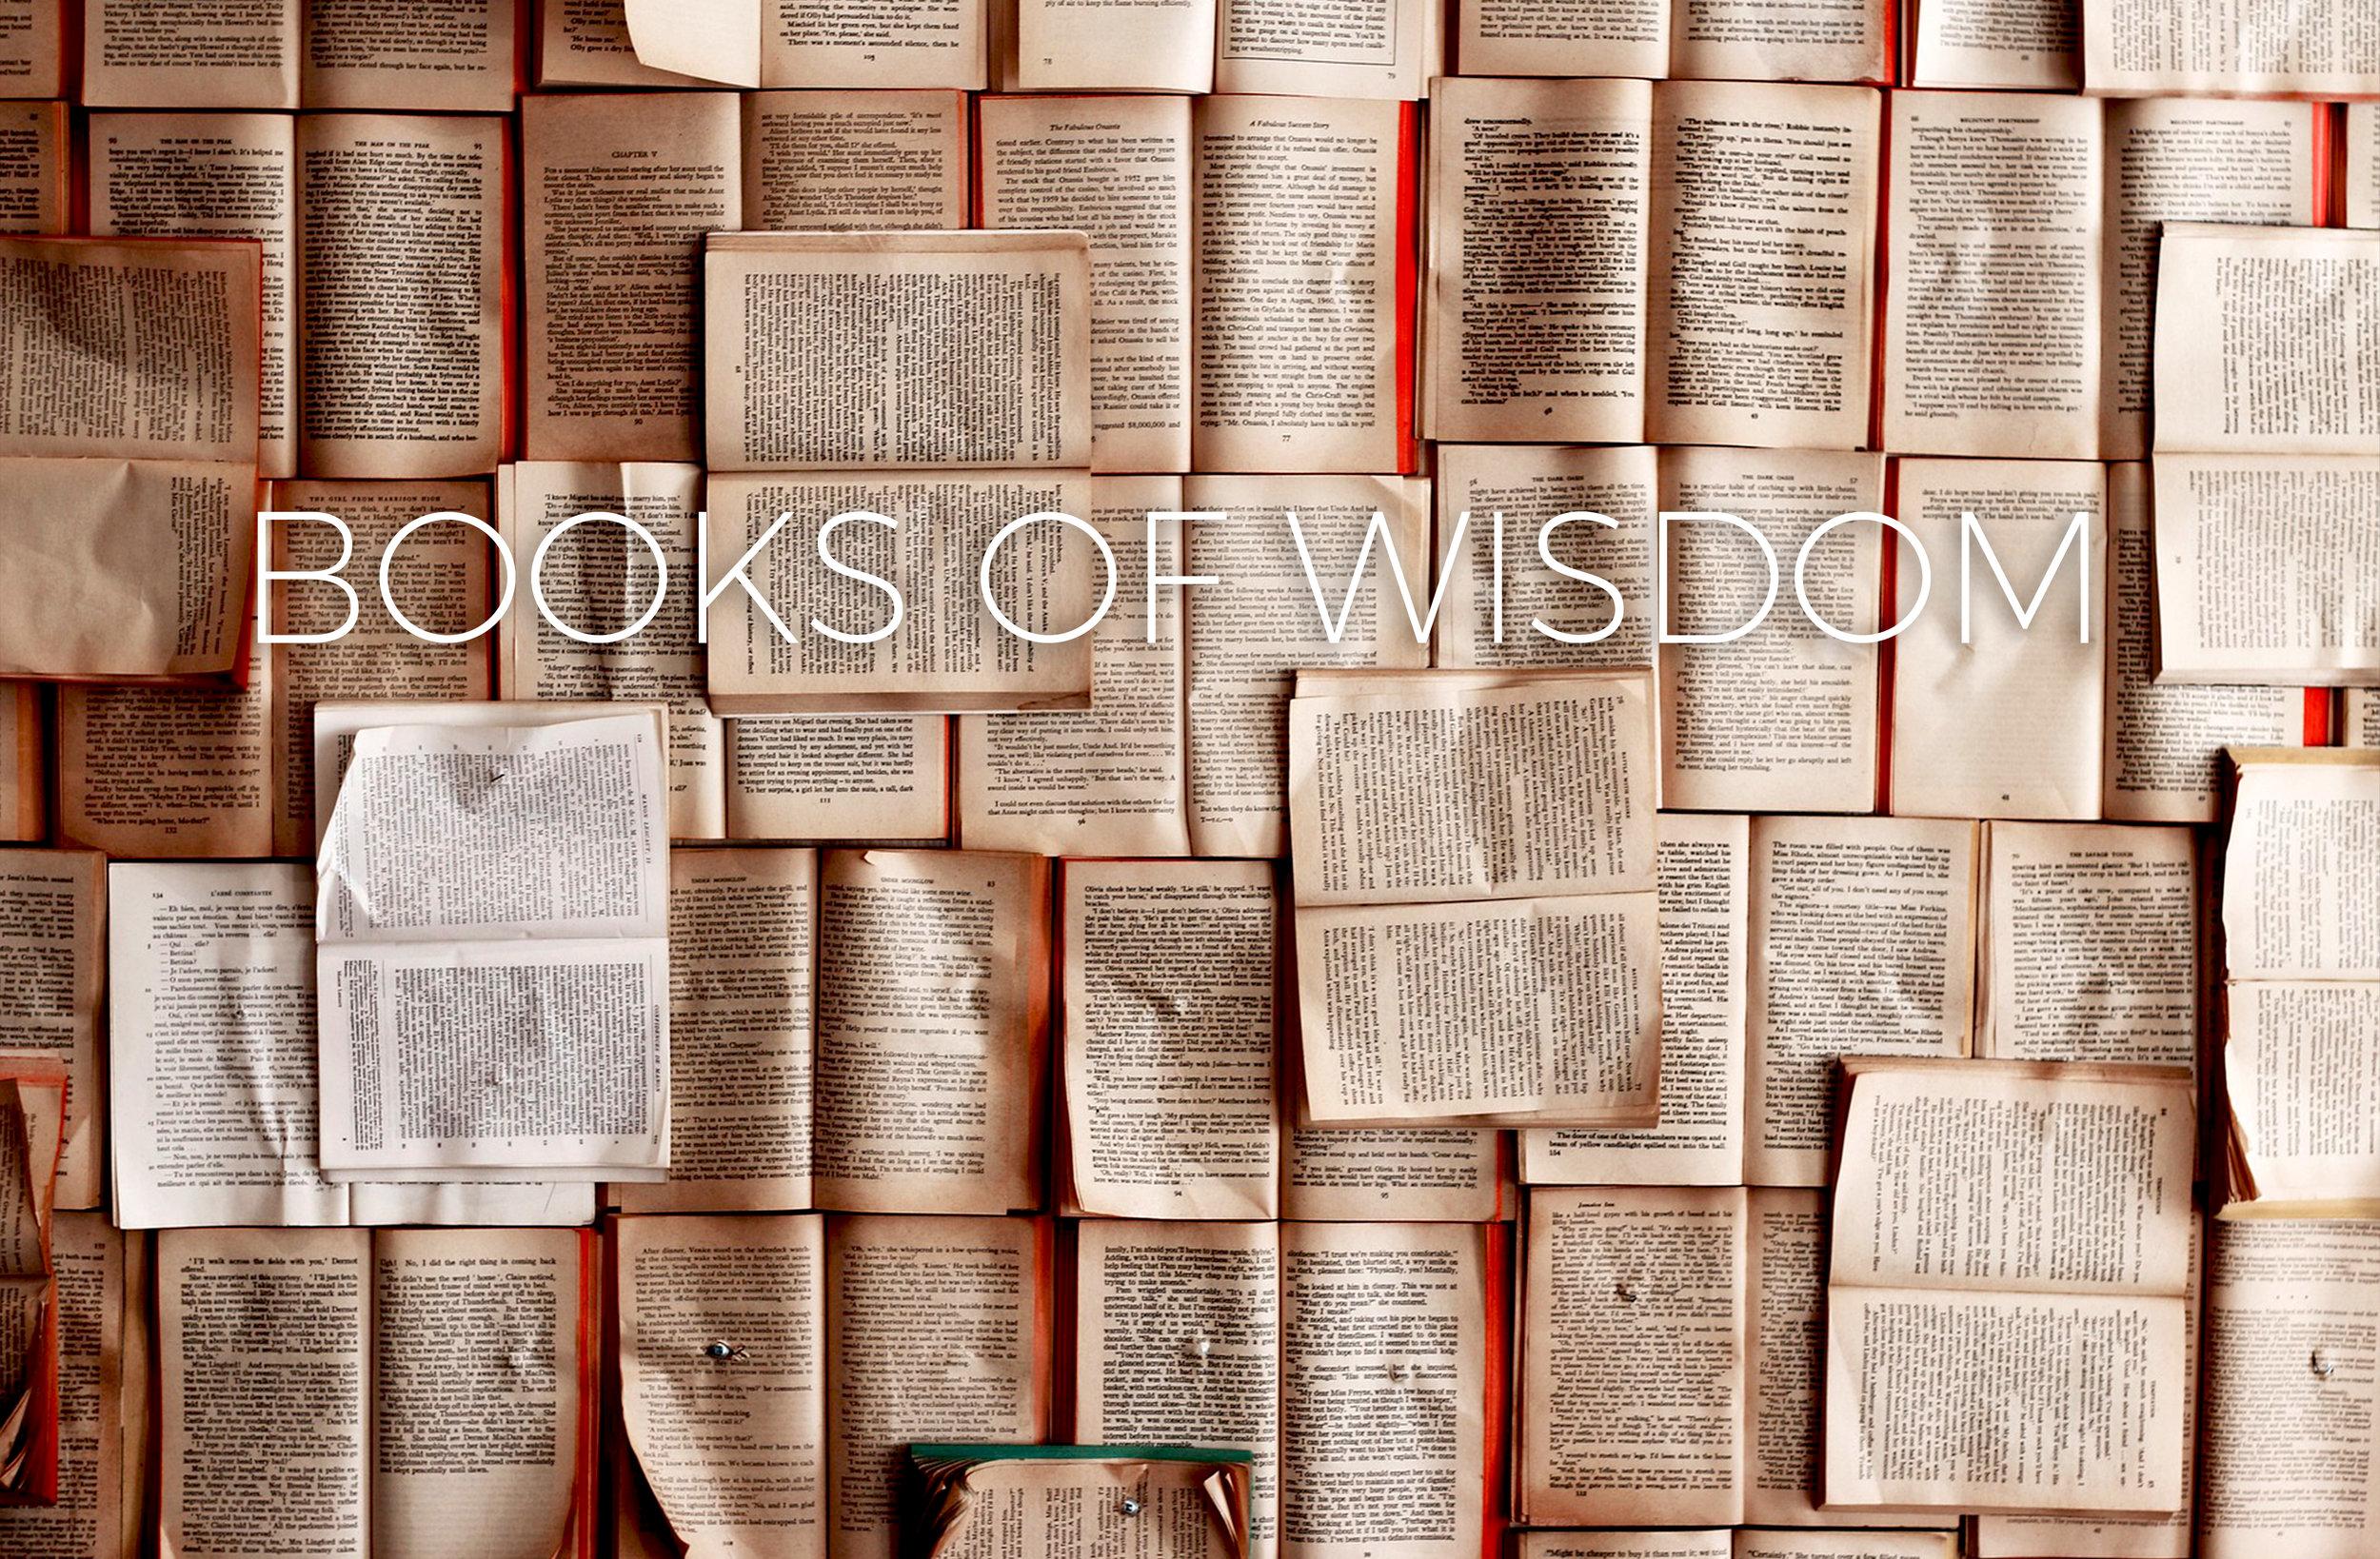 BOOKSOFWISDOMCOVER3.jpg